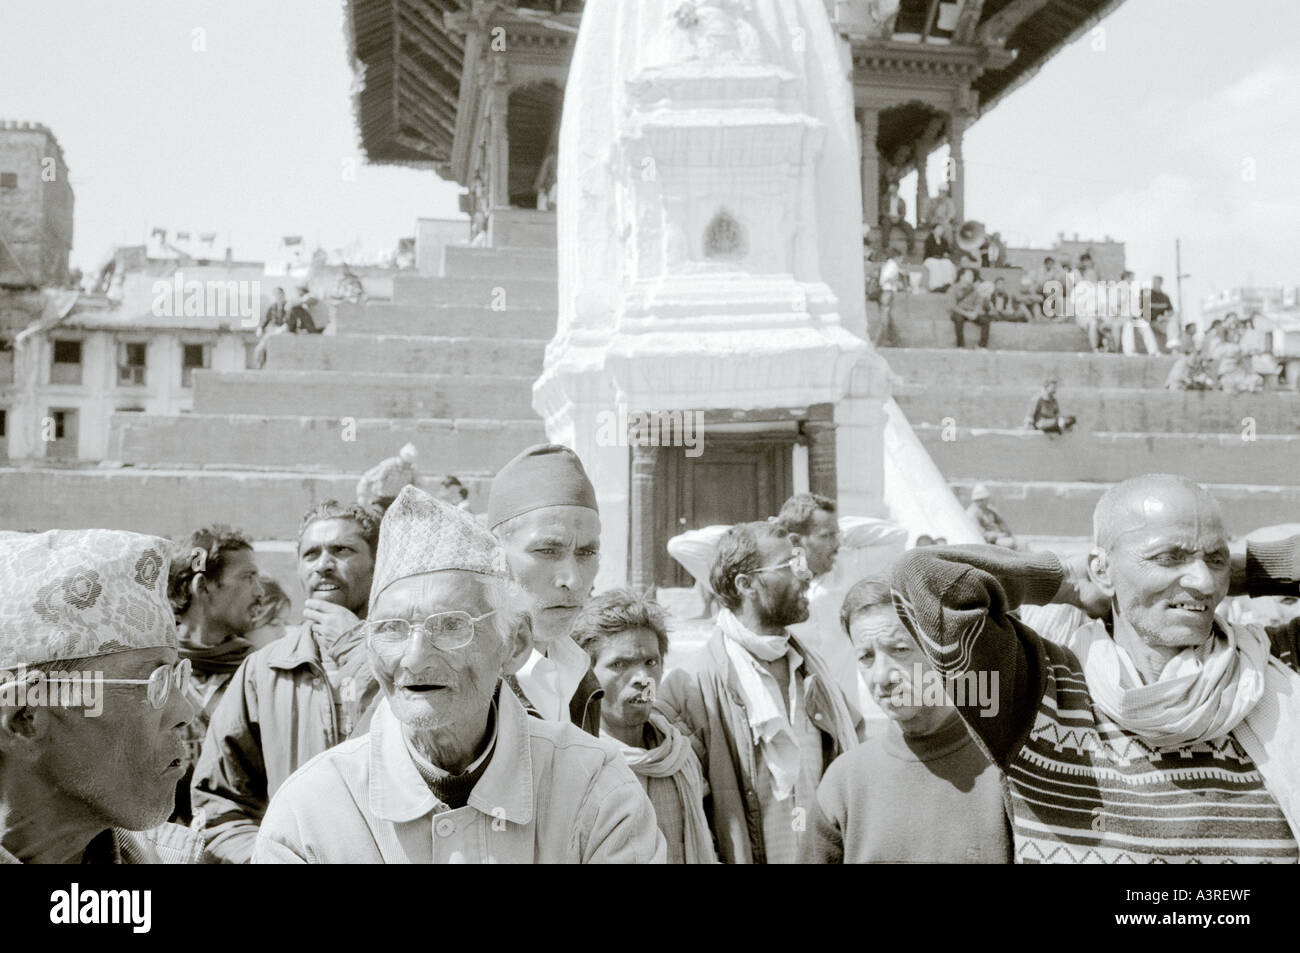 Travel Documentary Photography - Street scene of Hindu